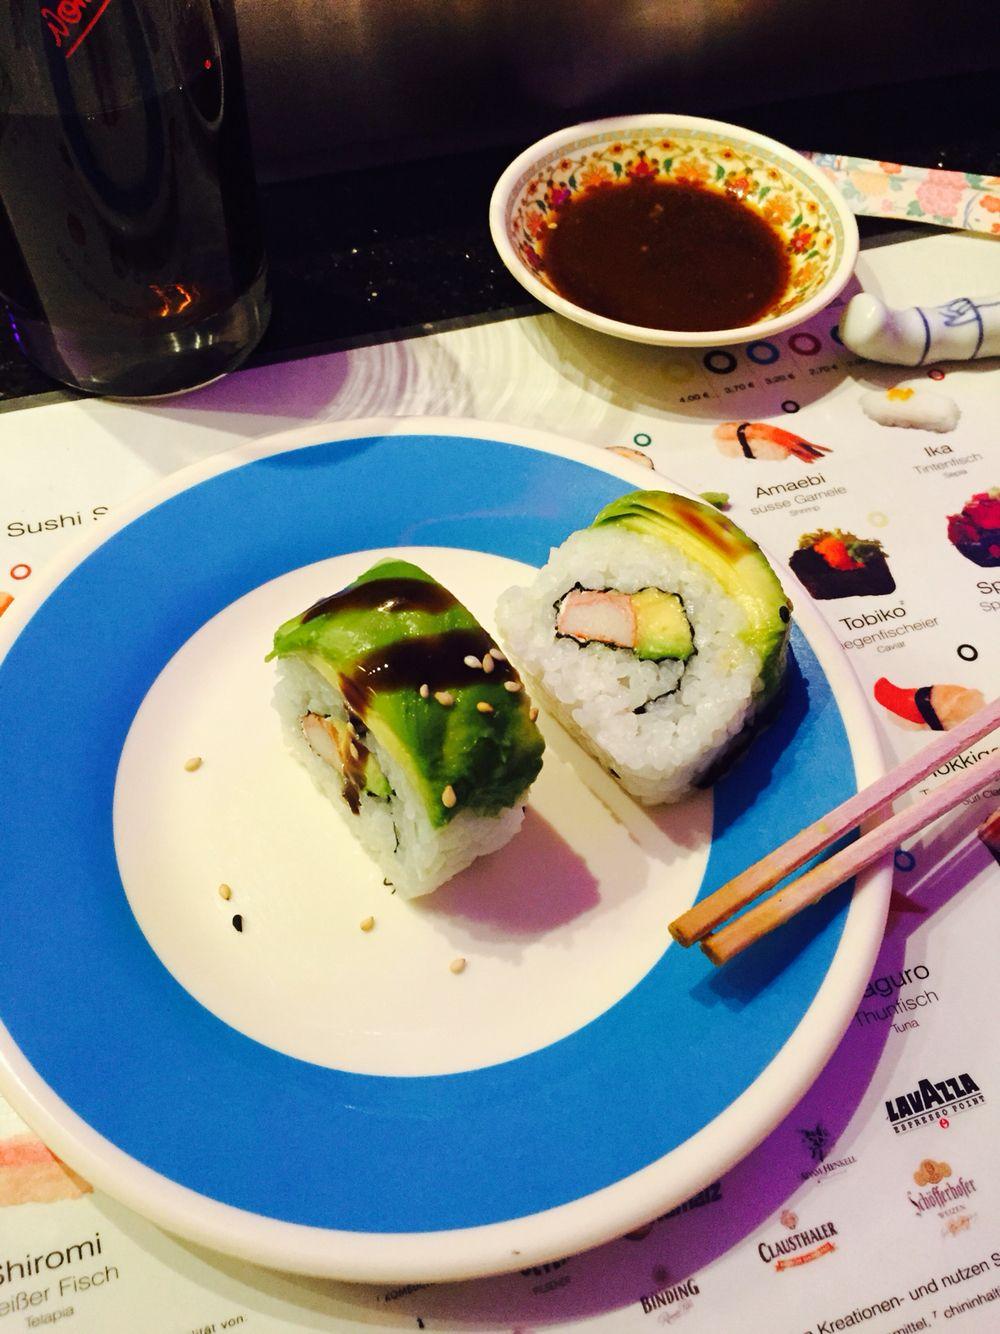 Sushi in frankfurt Food, Avocado egg, Avocado